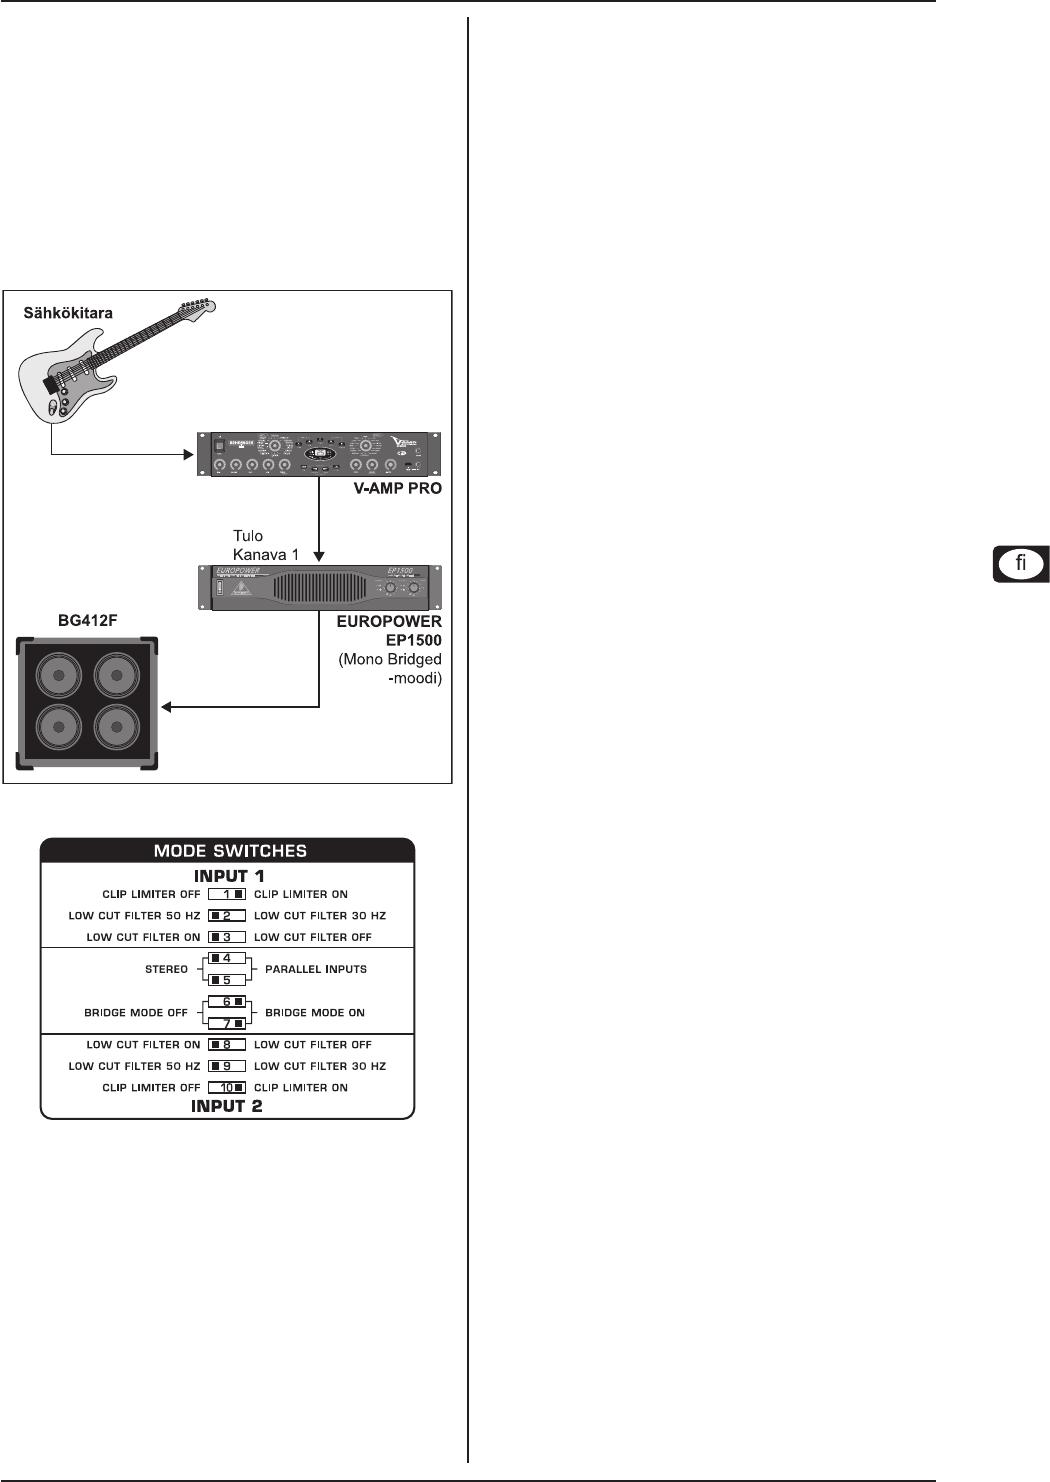 BEHRINGER CX2310 kytkennät rento kytkennät vinkkejä